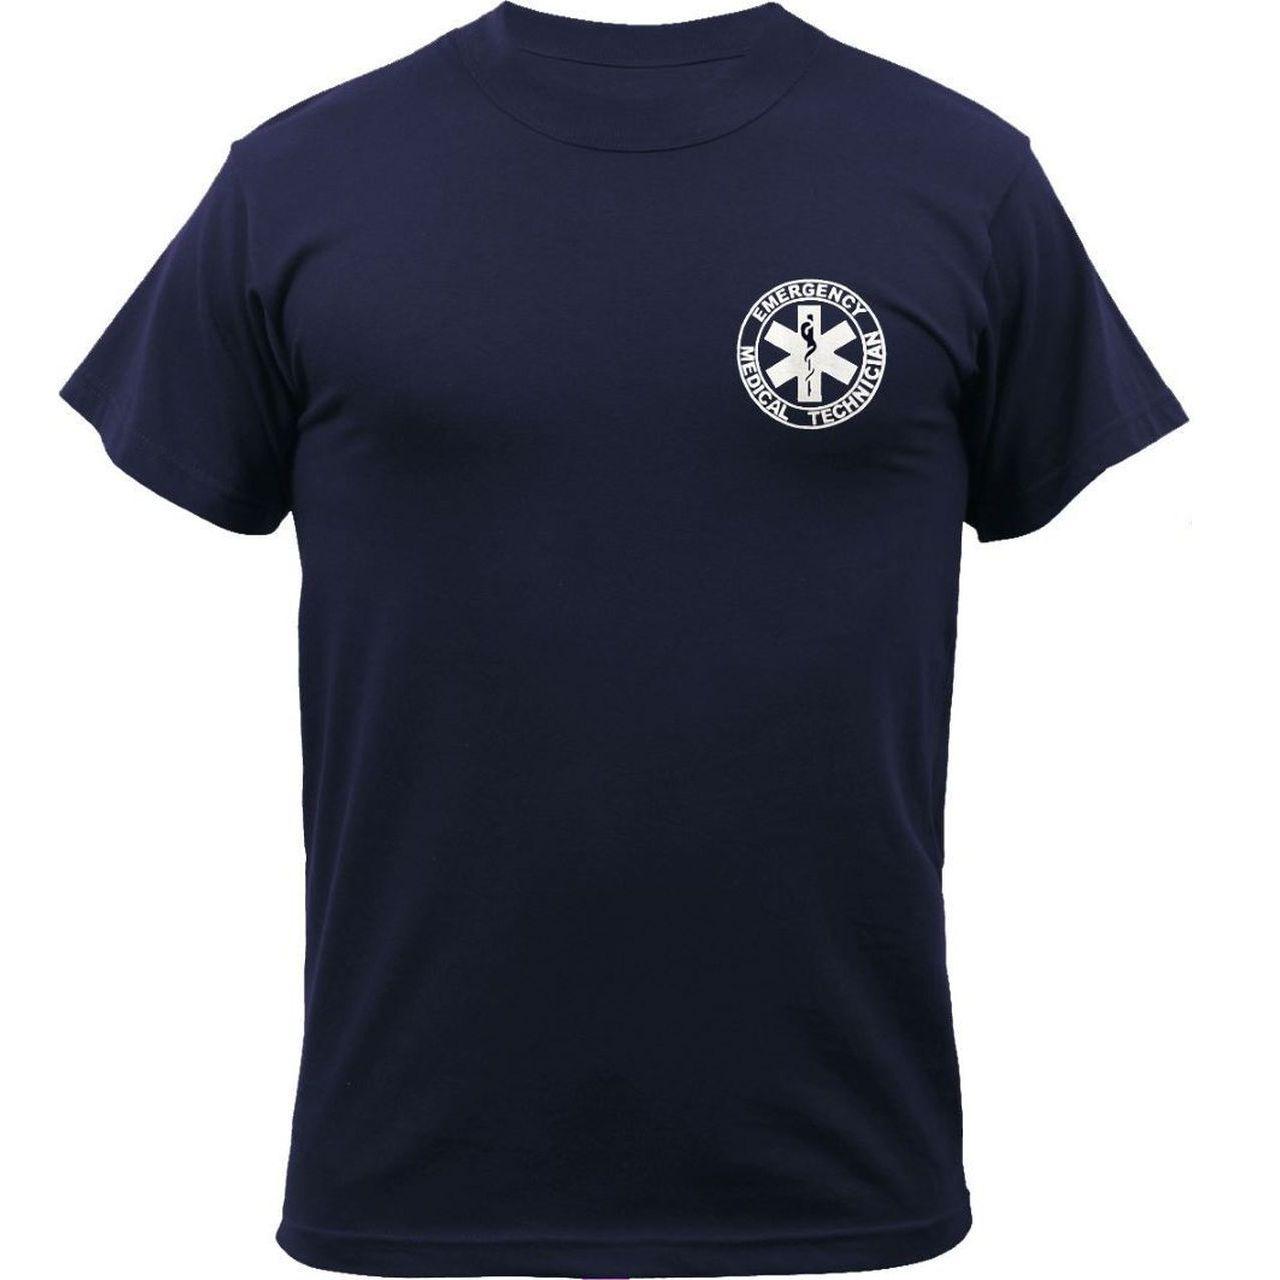 Kemp USA Navy EMT Shirt With Front And Back Logo - Medium